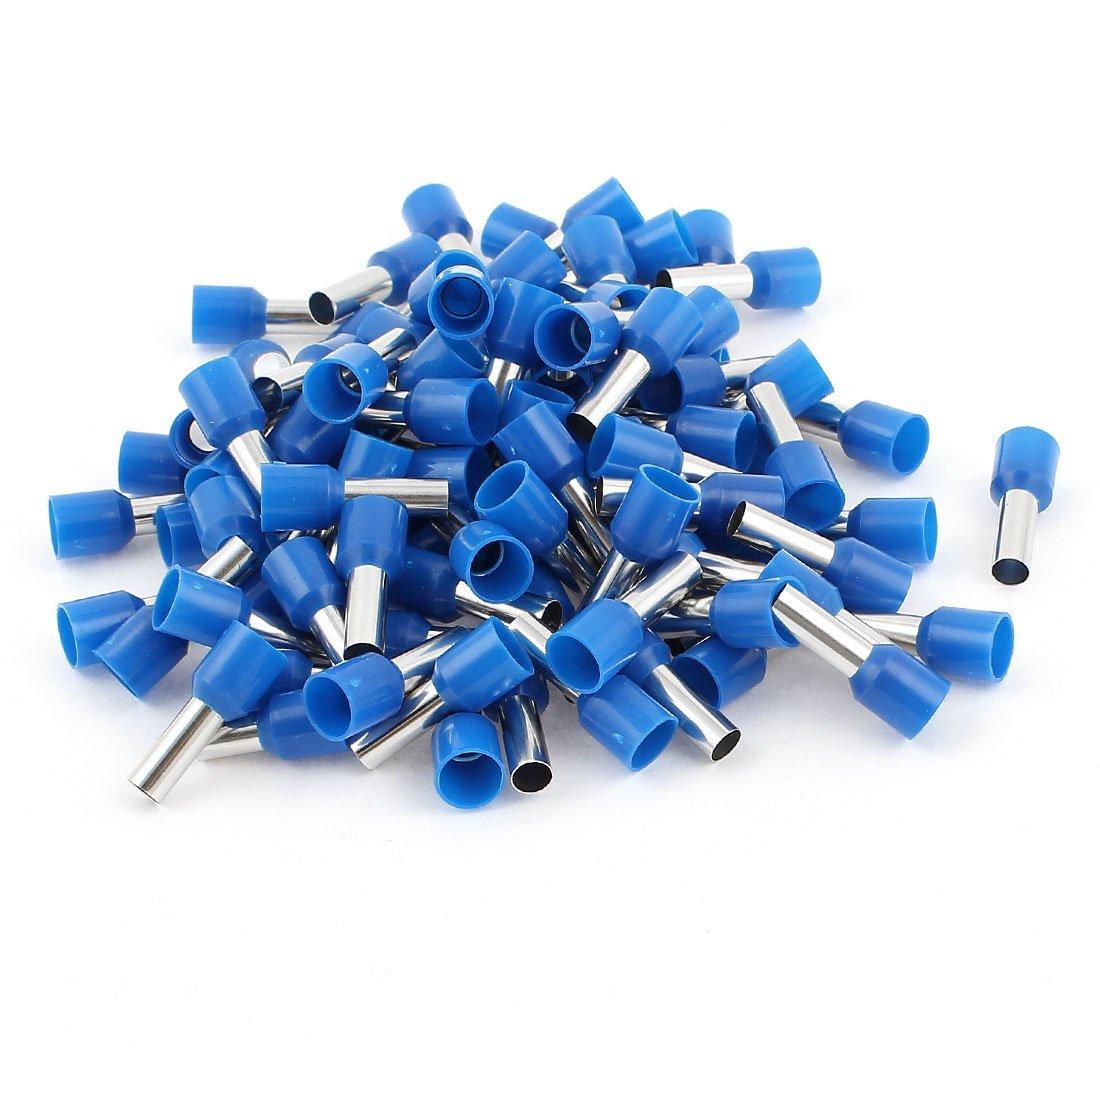 100 PC-10mm2 Cord End Insulated Aderendhü lsen Terminal-Blau Crimp DealMux DLM-B00TX43W6S